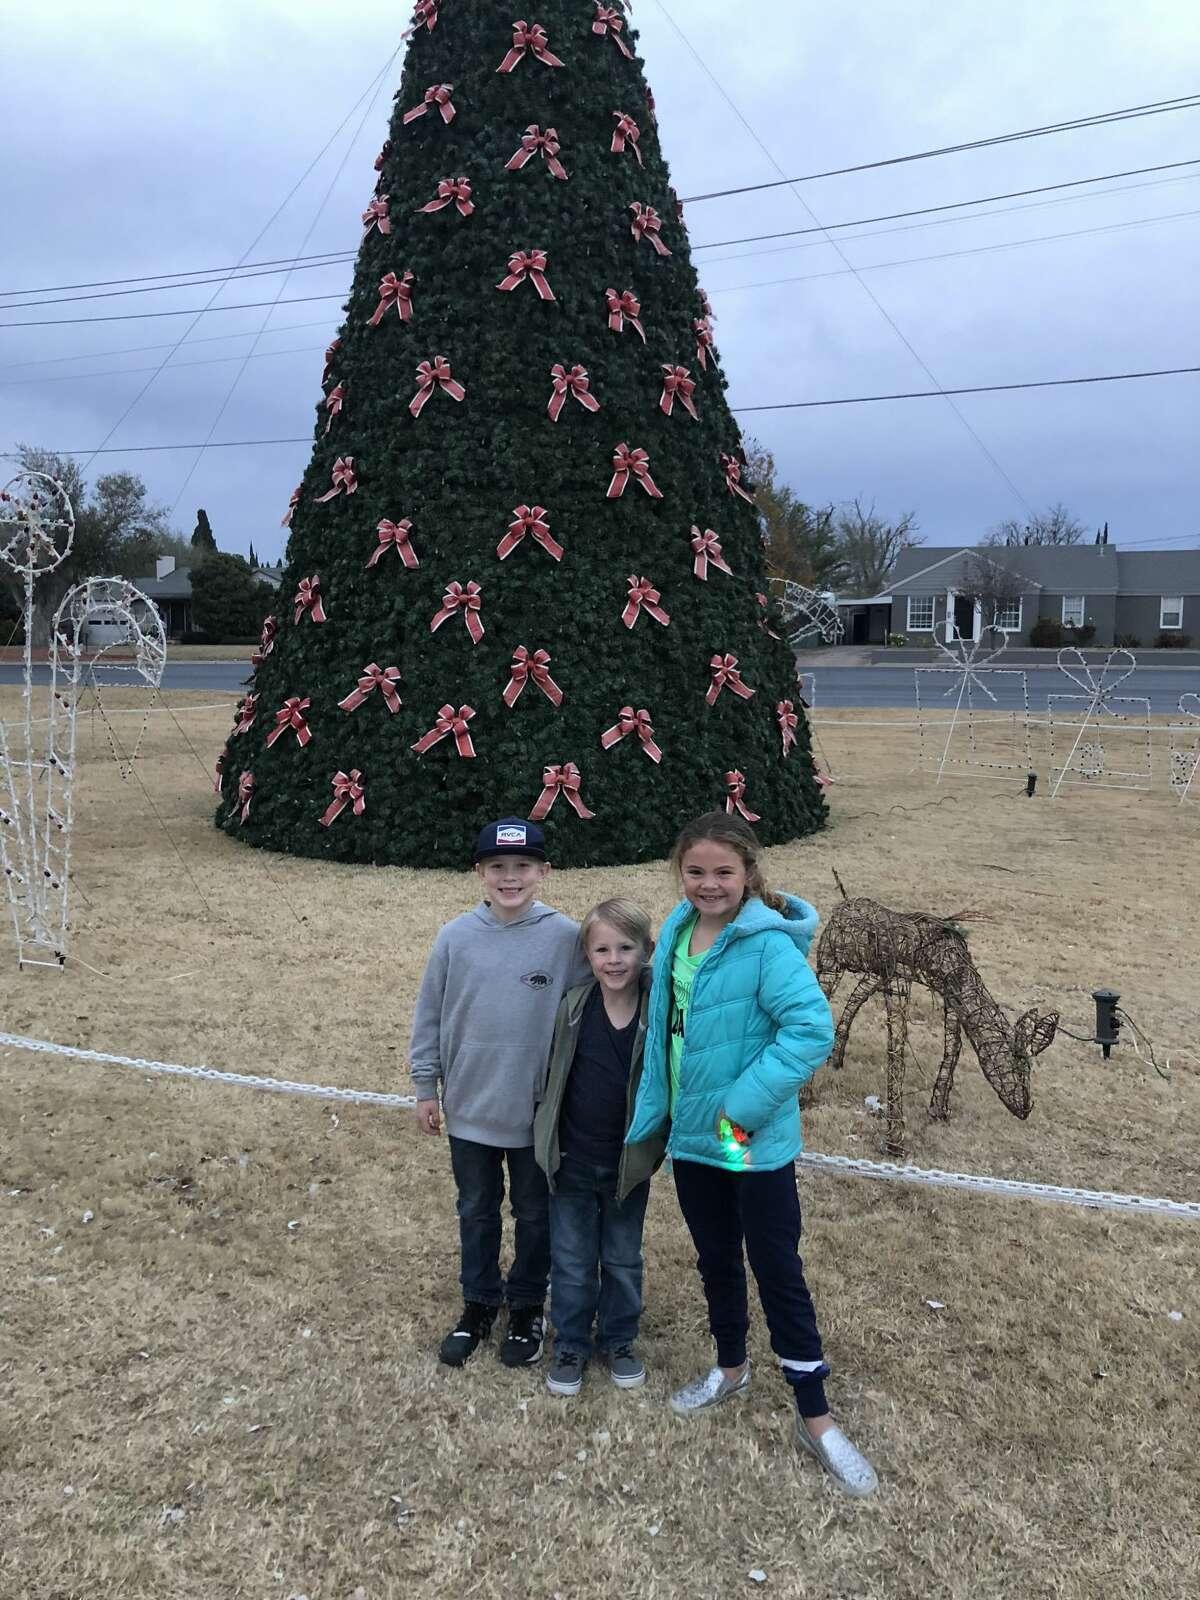 Tree lighting: Branson Edgecomb, from left, Beckett Edgecomb and Audia Kinzler